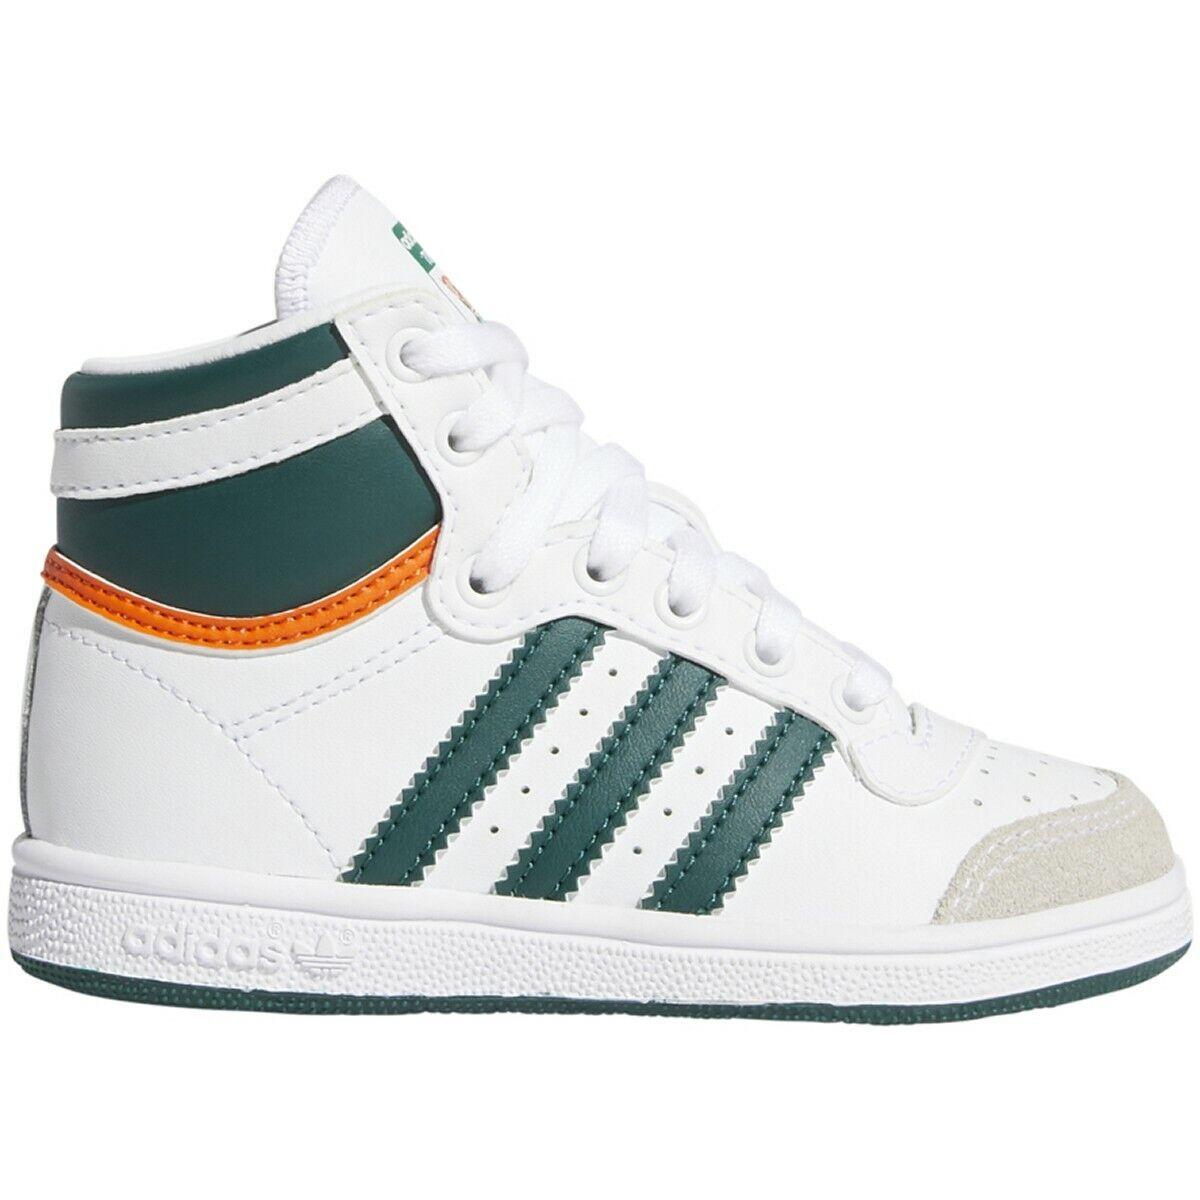 New Baby Adidas Originals Top Ten High Toddler Shoes (EF2840) White/Green-Orange